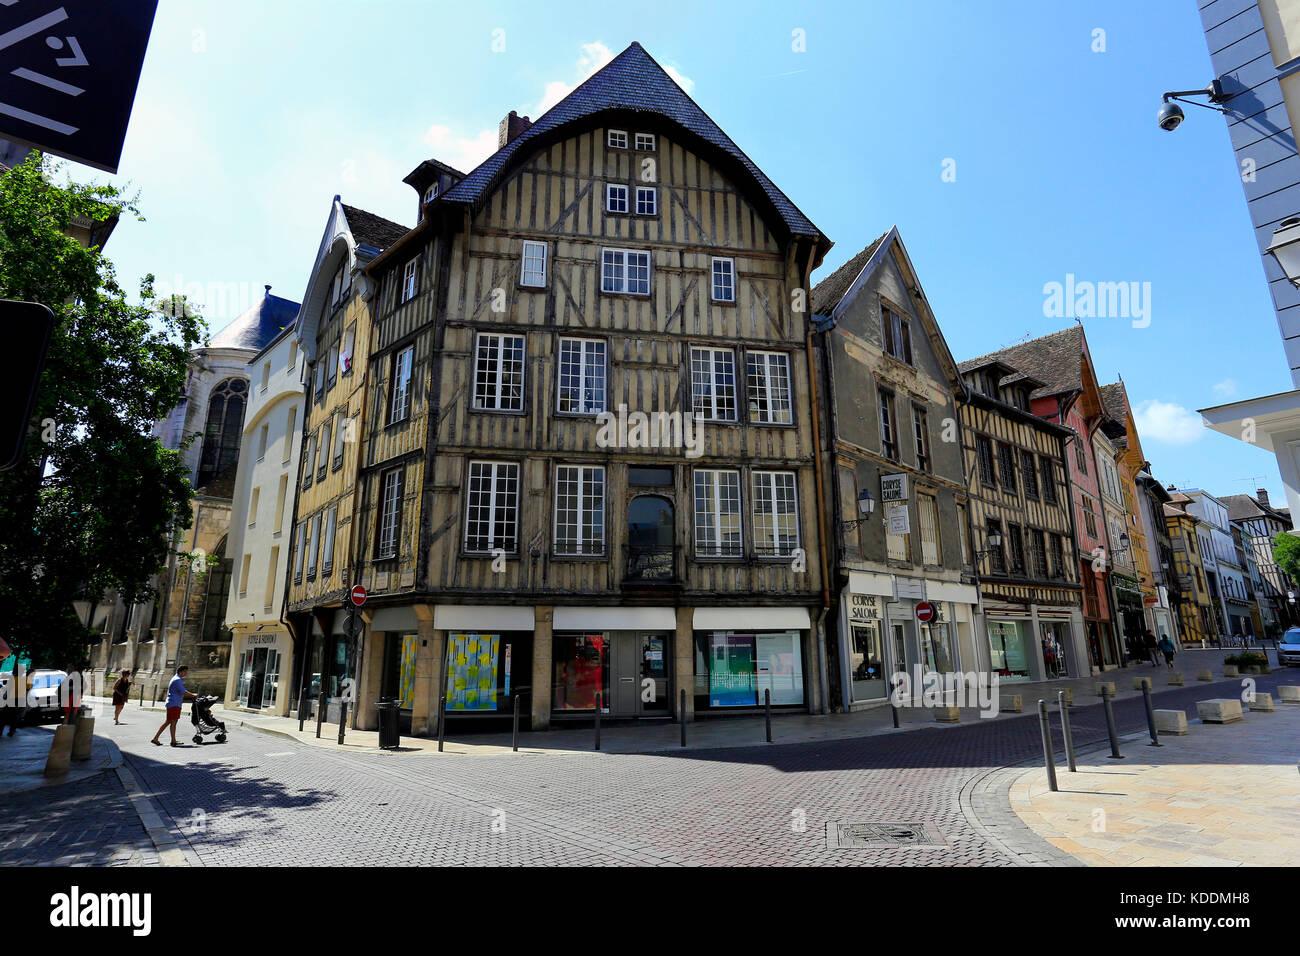 Troyes, France - Stock Image